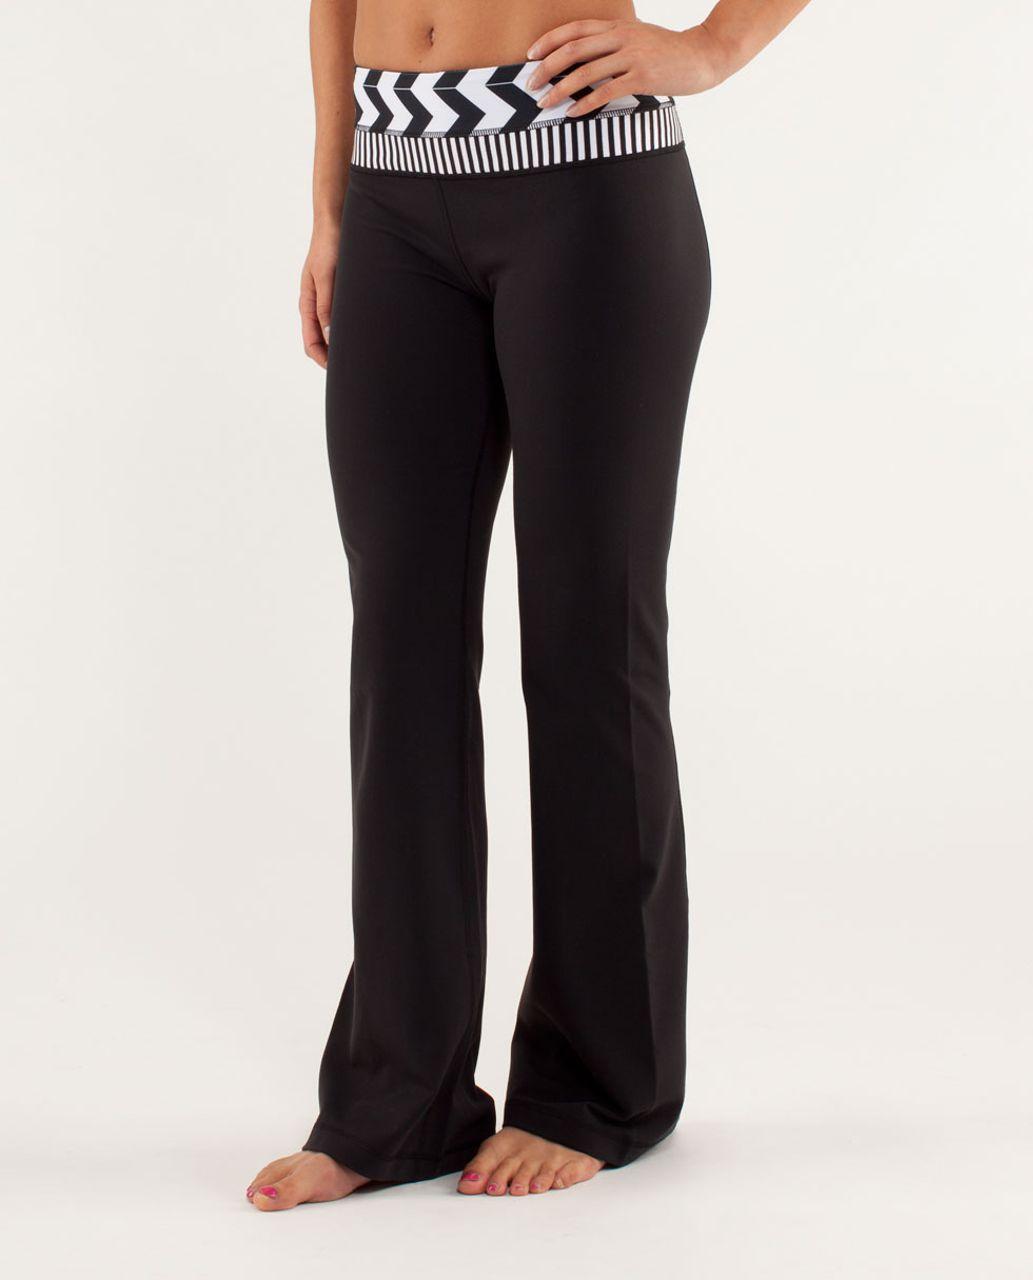 Lululemon Groove Pant *Slim (Tall) - Black / Arrow Chevron White Black / Classic Stripe Black And White